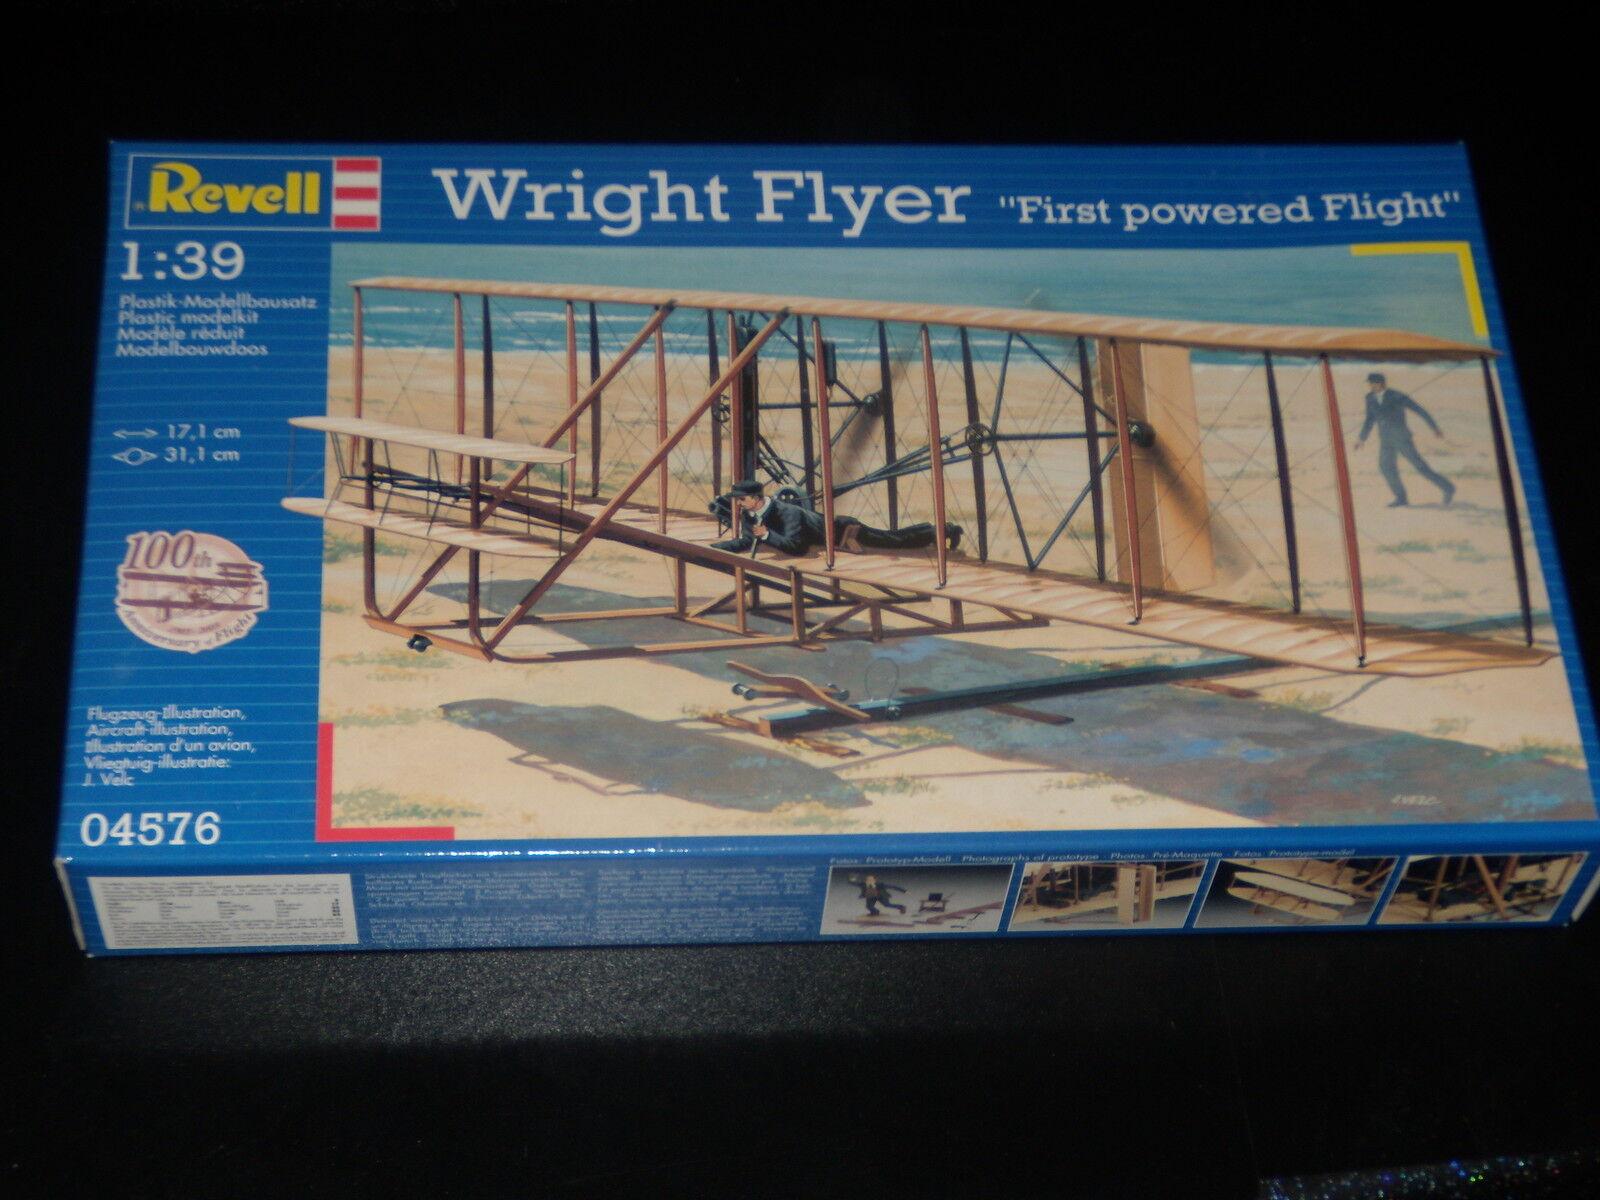 MODEL - WRIGHT FLYER - FIRST OWERED FLIGHT - REVELL - 1 39 - FULLY